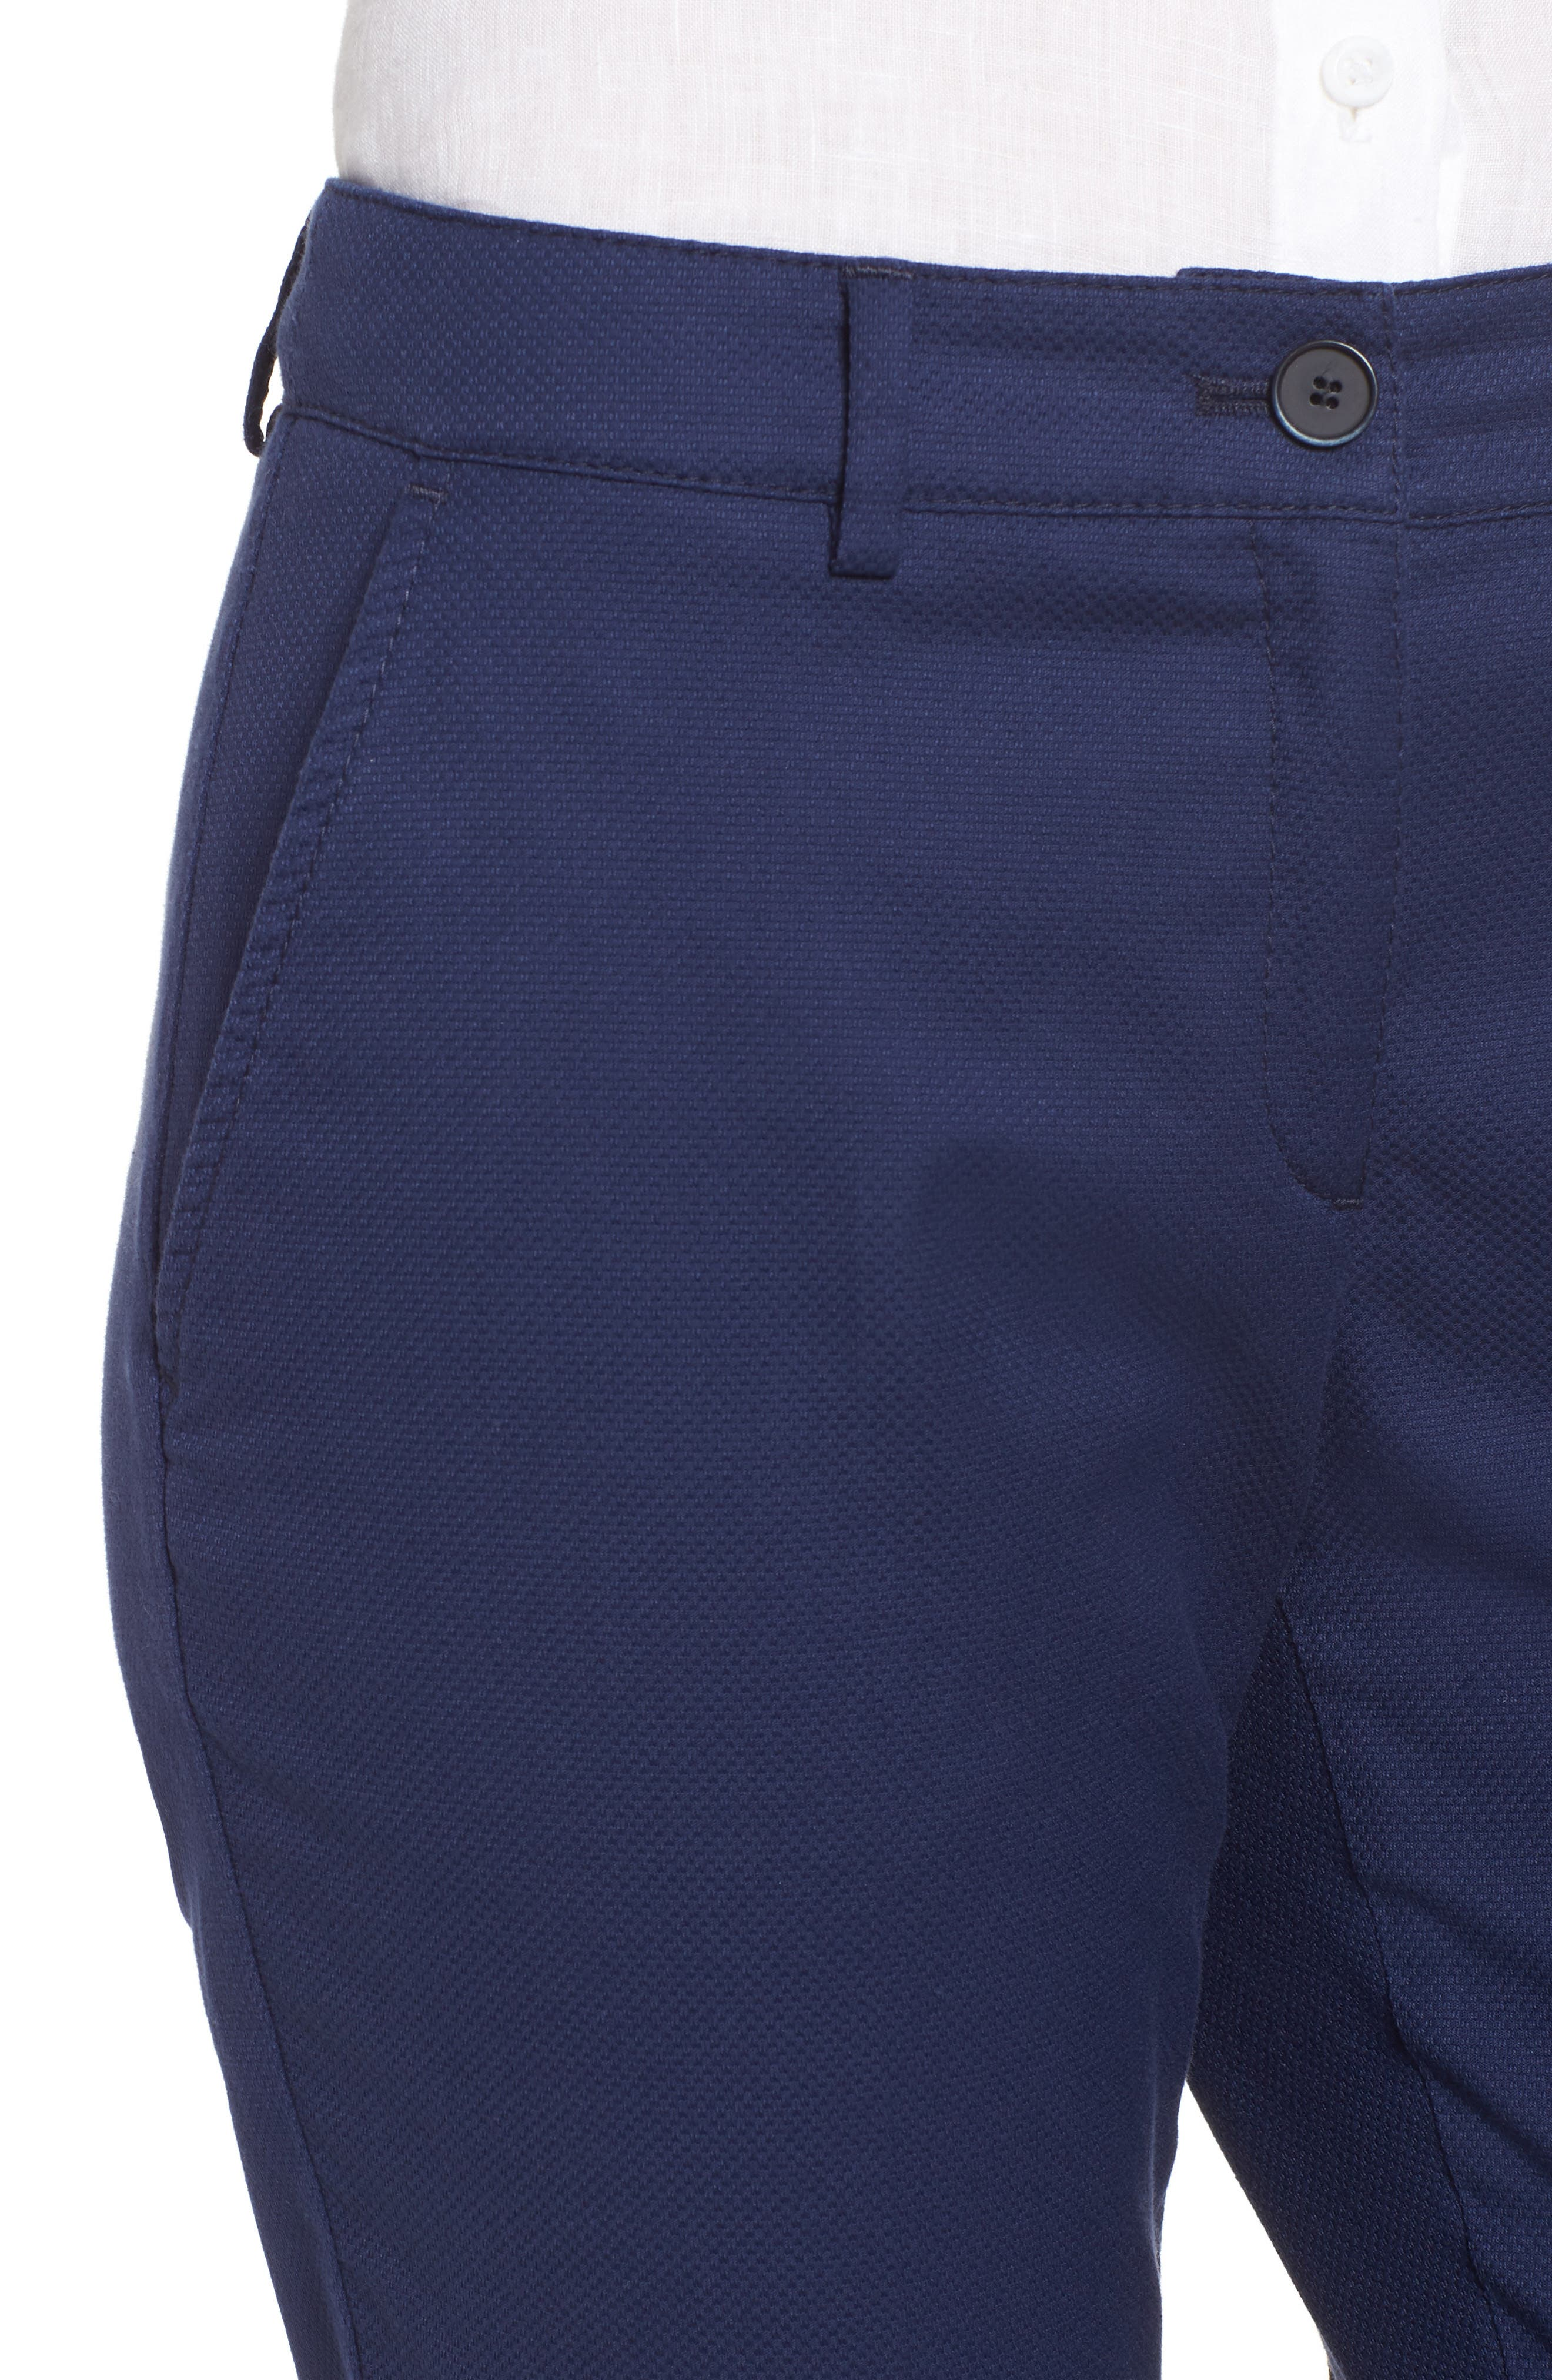 Maron Cuffed Straight Leg Pants,                             Alternate thumbnail 4, color,